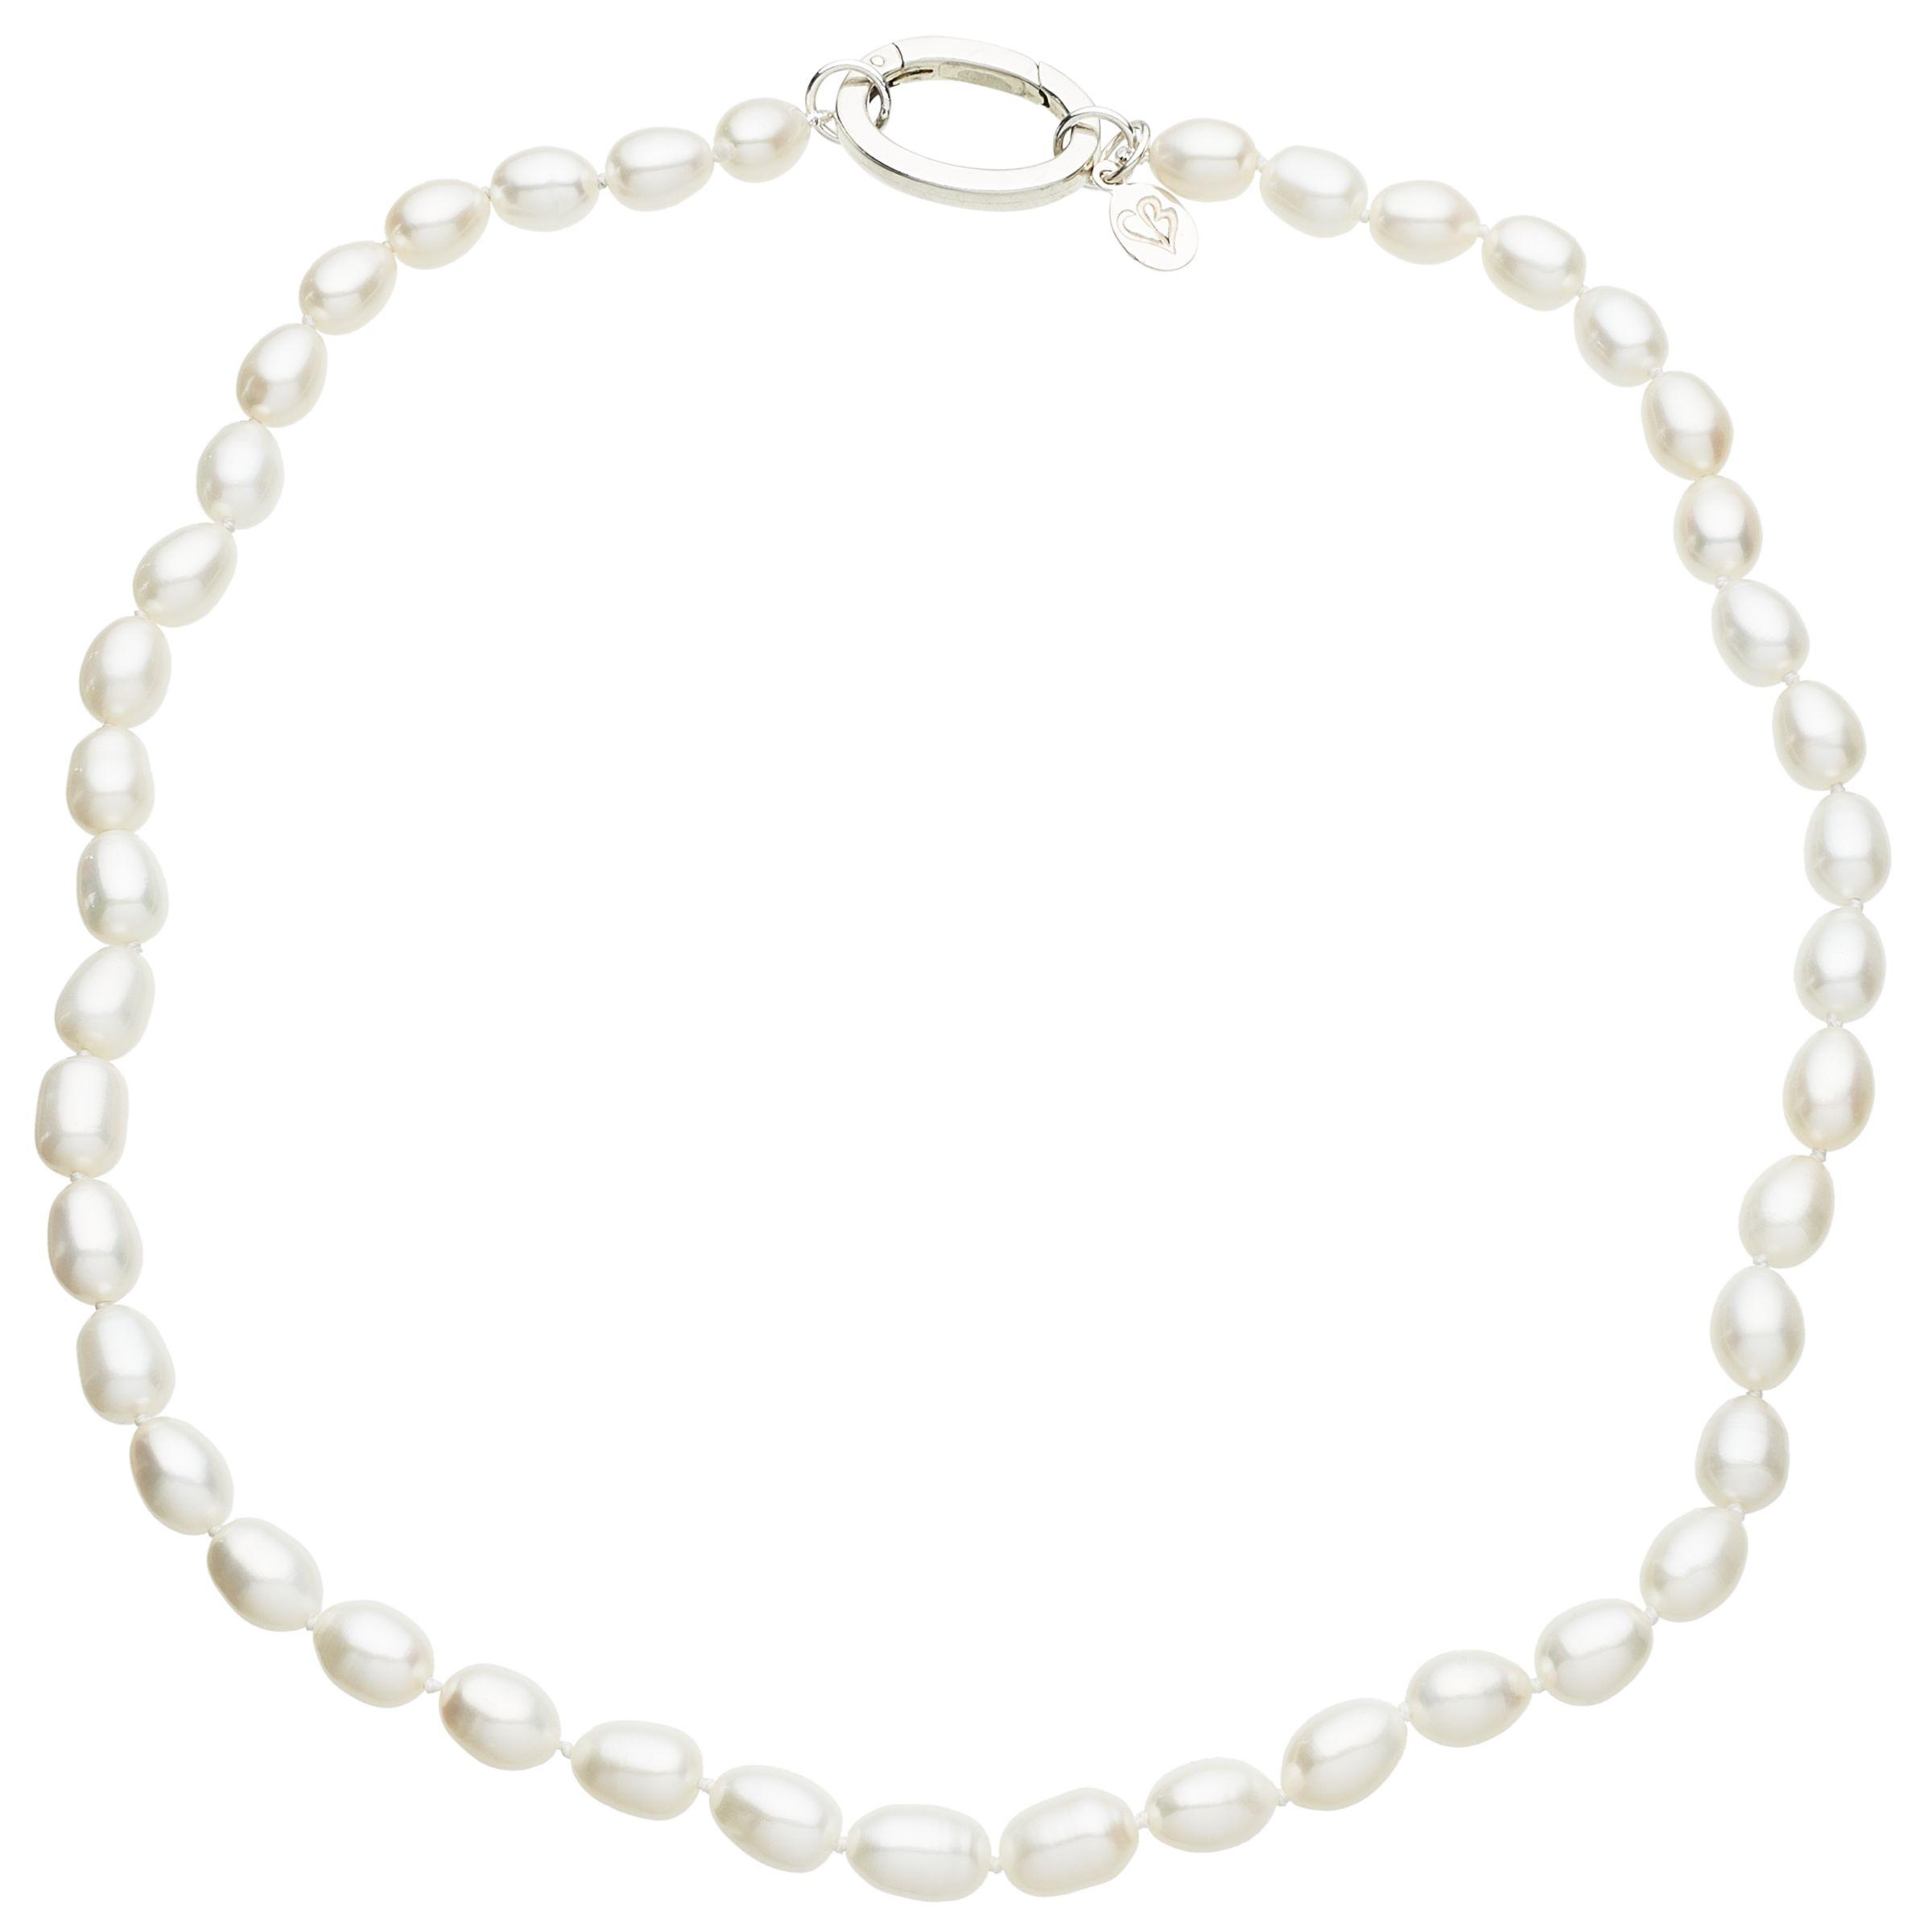 Claudia Bradby Claudia Bradby Rice Pearl Necklace